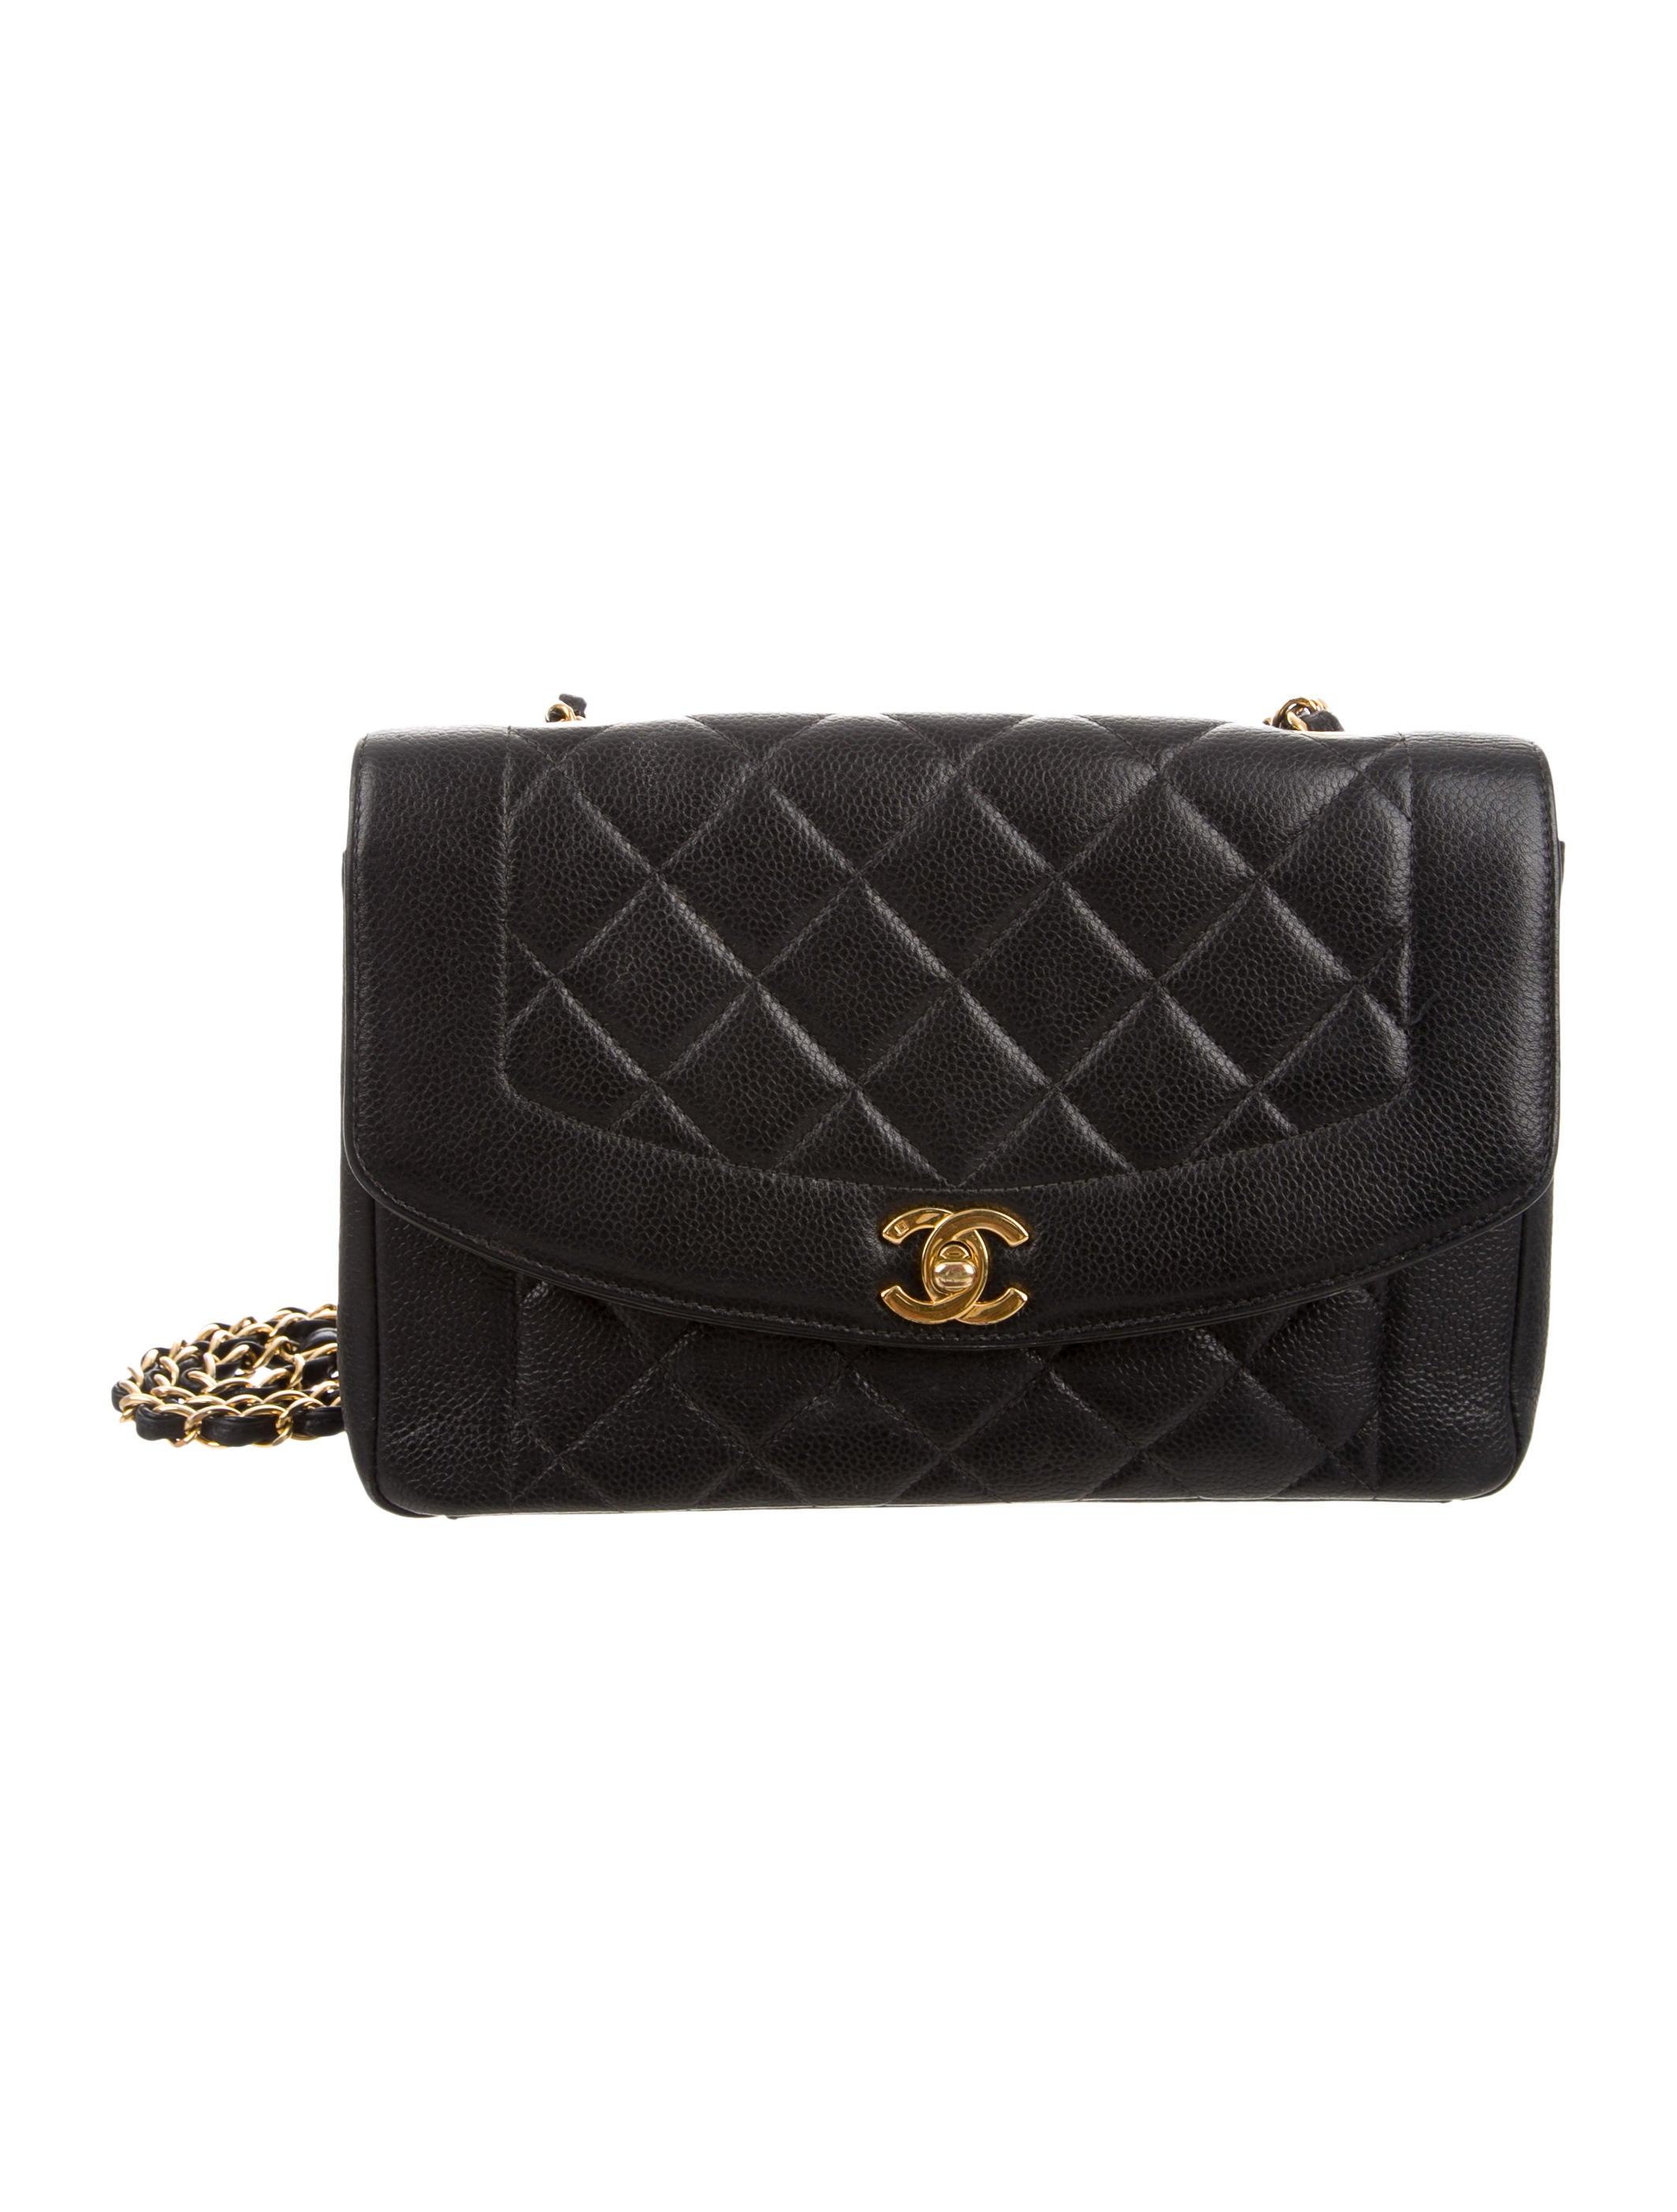 8317c966934f Chanel Diana Flap Bag - Handbags - CHA151948 | The RealReal